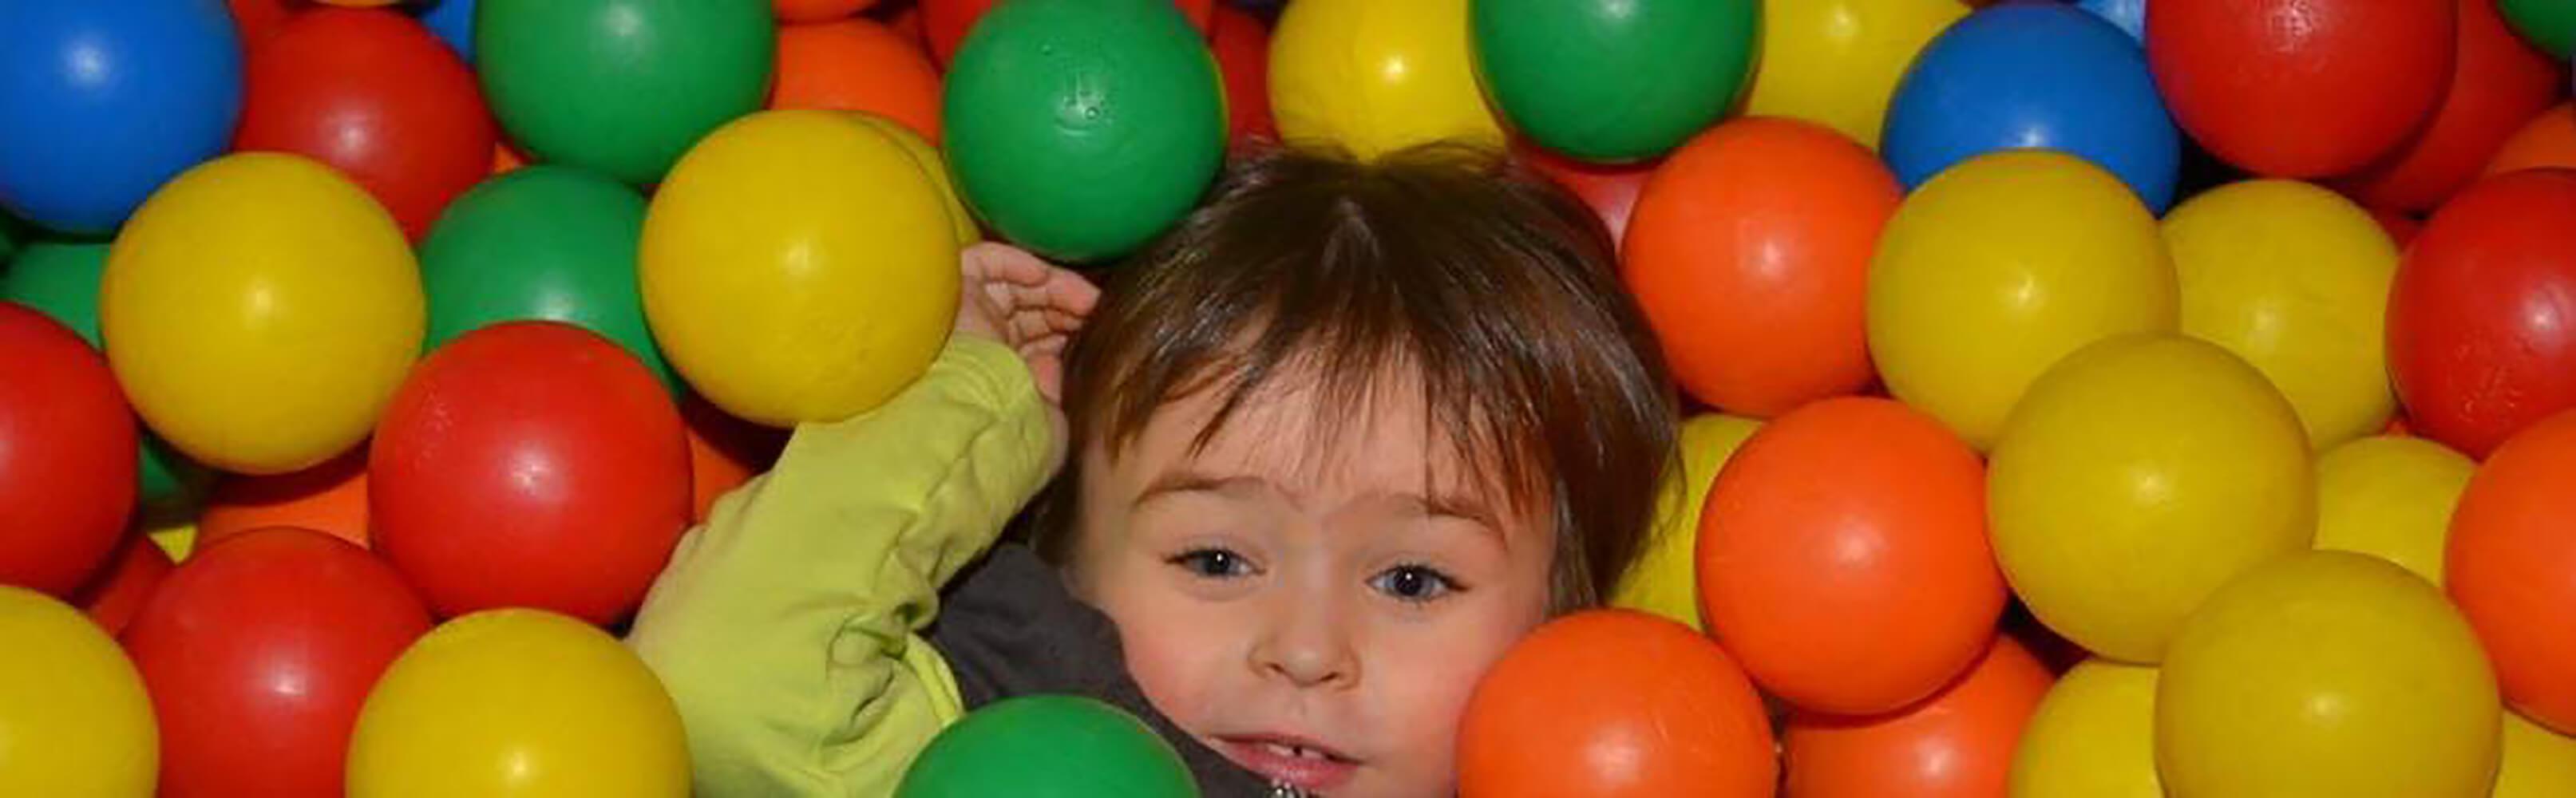 Trampolino - Das Kinderparadies 1